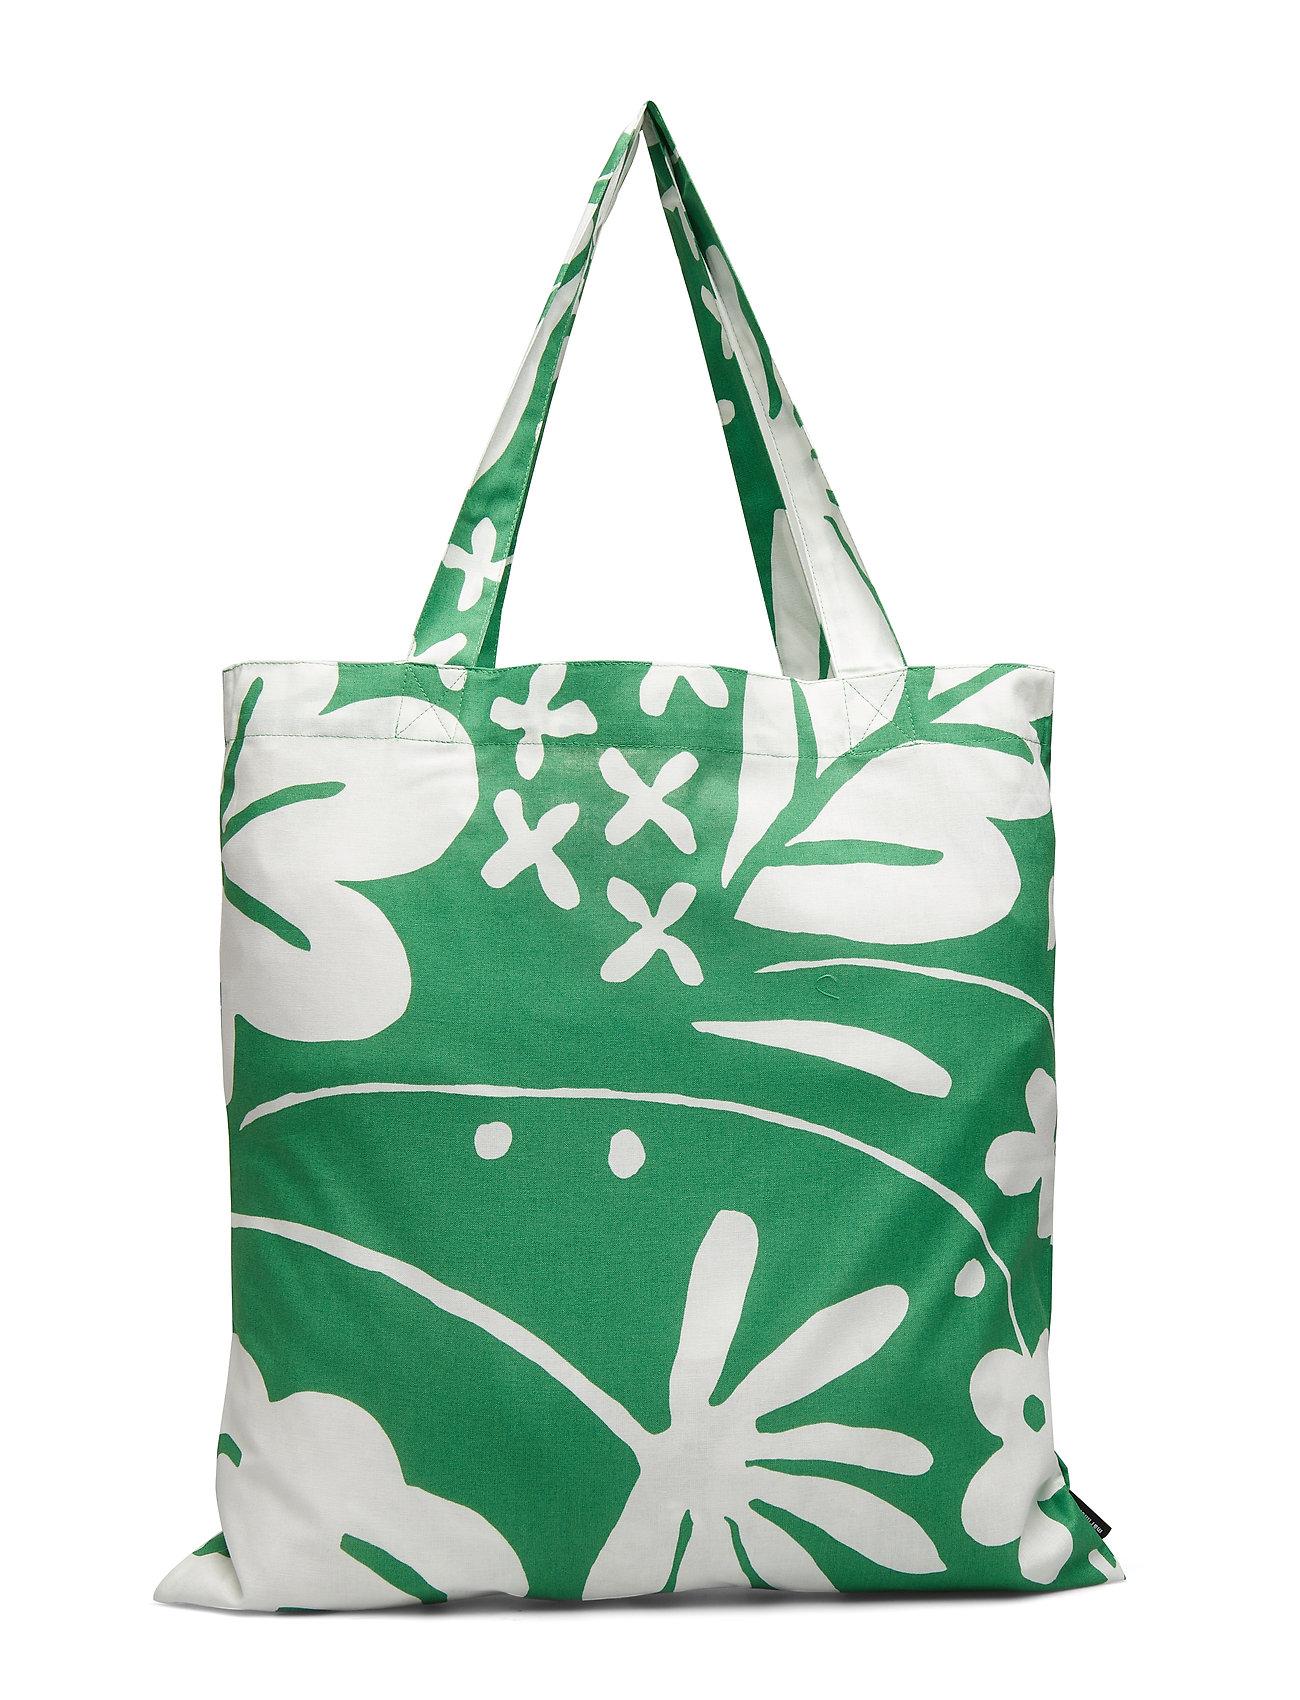 Marimekko Home ONNI BAG - GREEN, WHITE